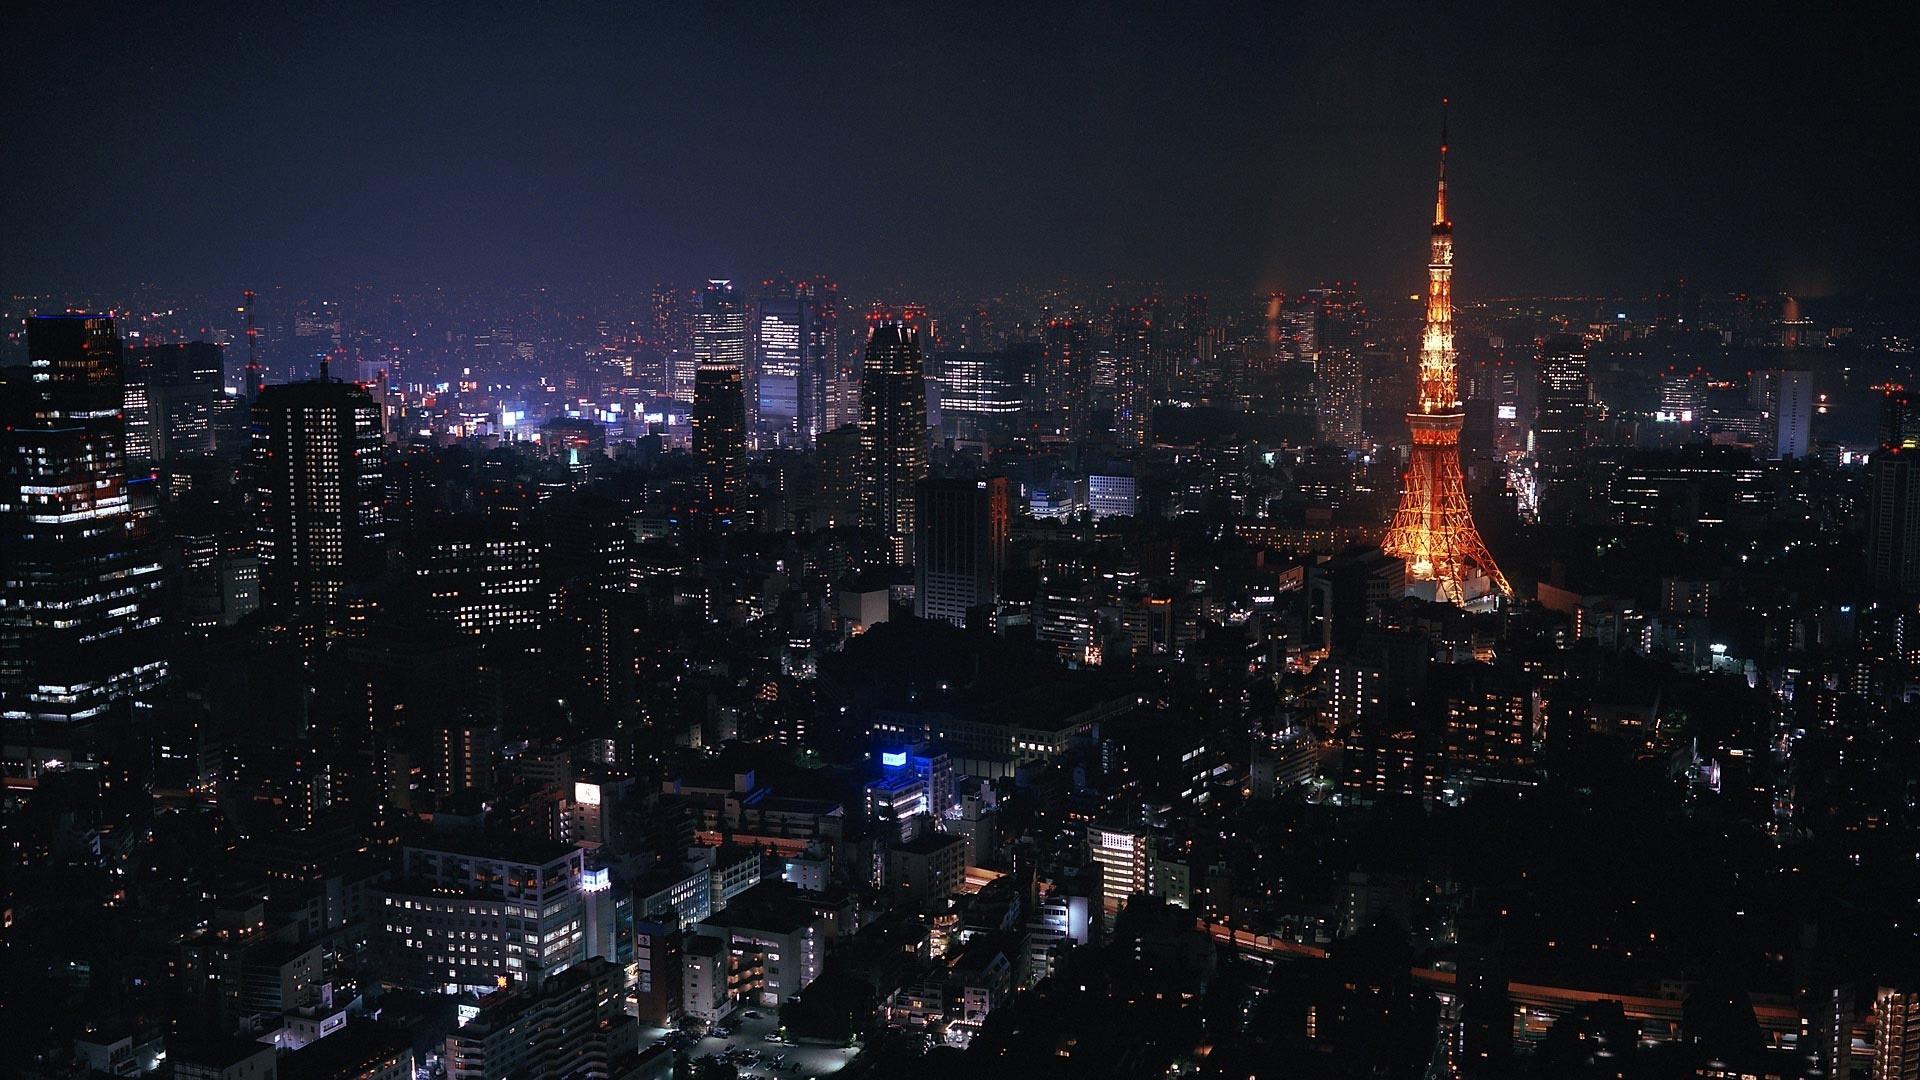 Download Wallpaper 1920x1080 Tokyo Japan City Night Lights Full